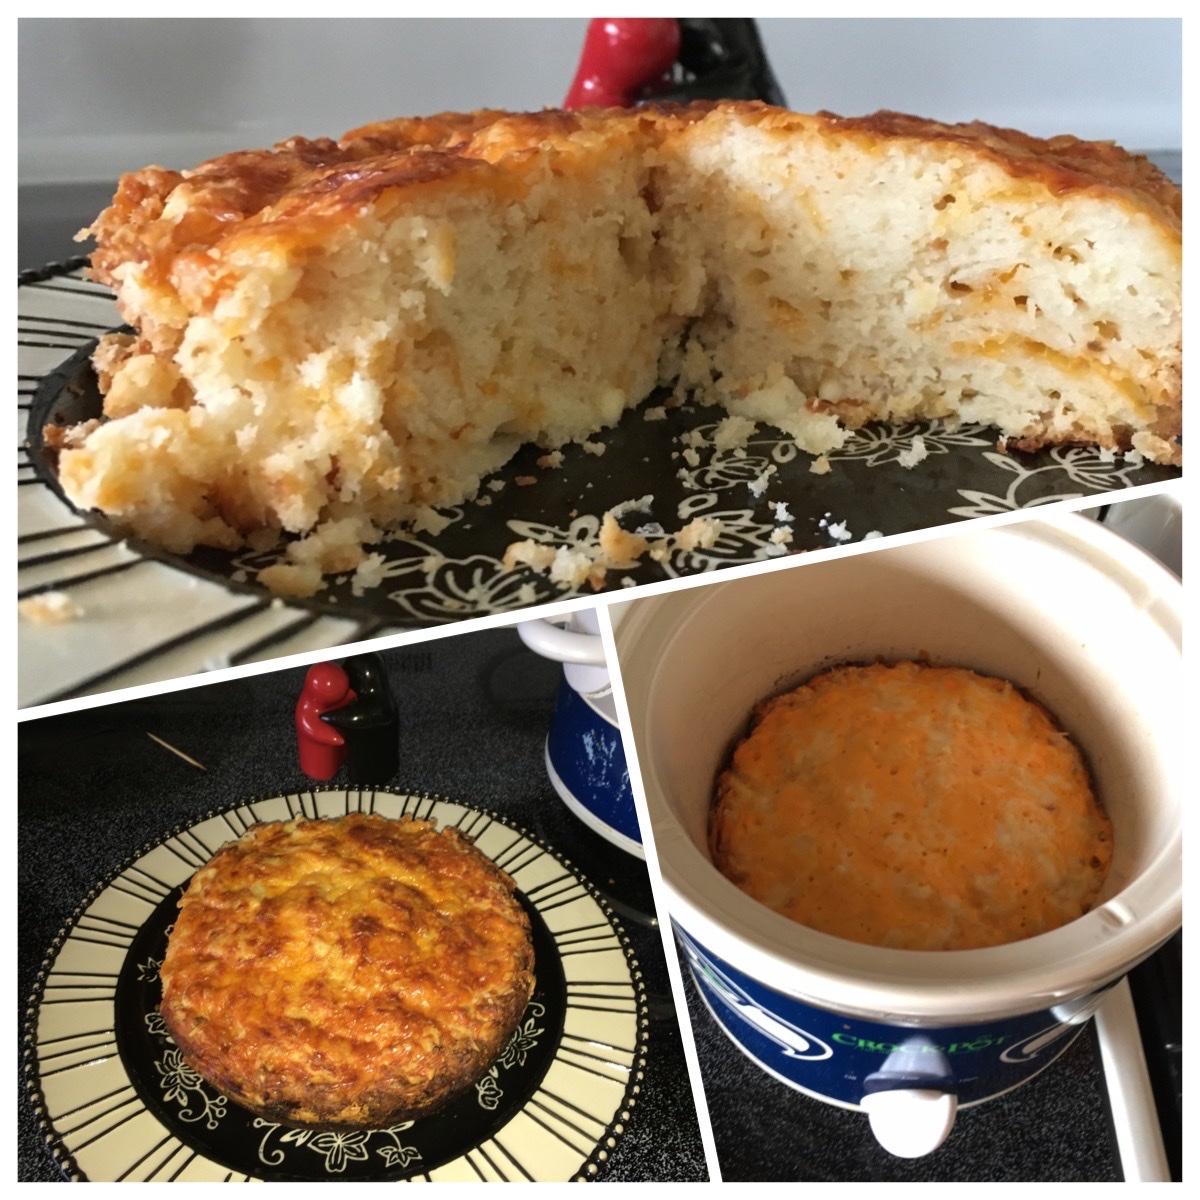 Slow Cooker Parmesan-Garlic Quick Bread